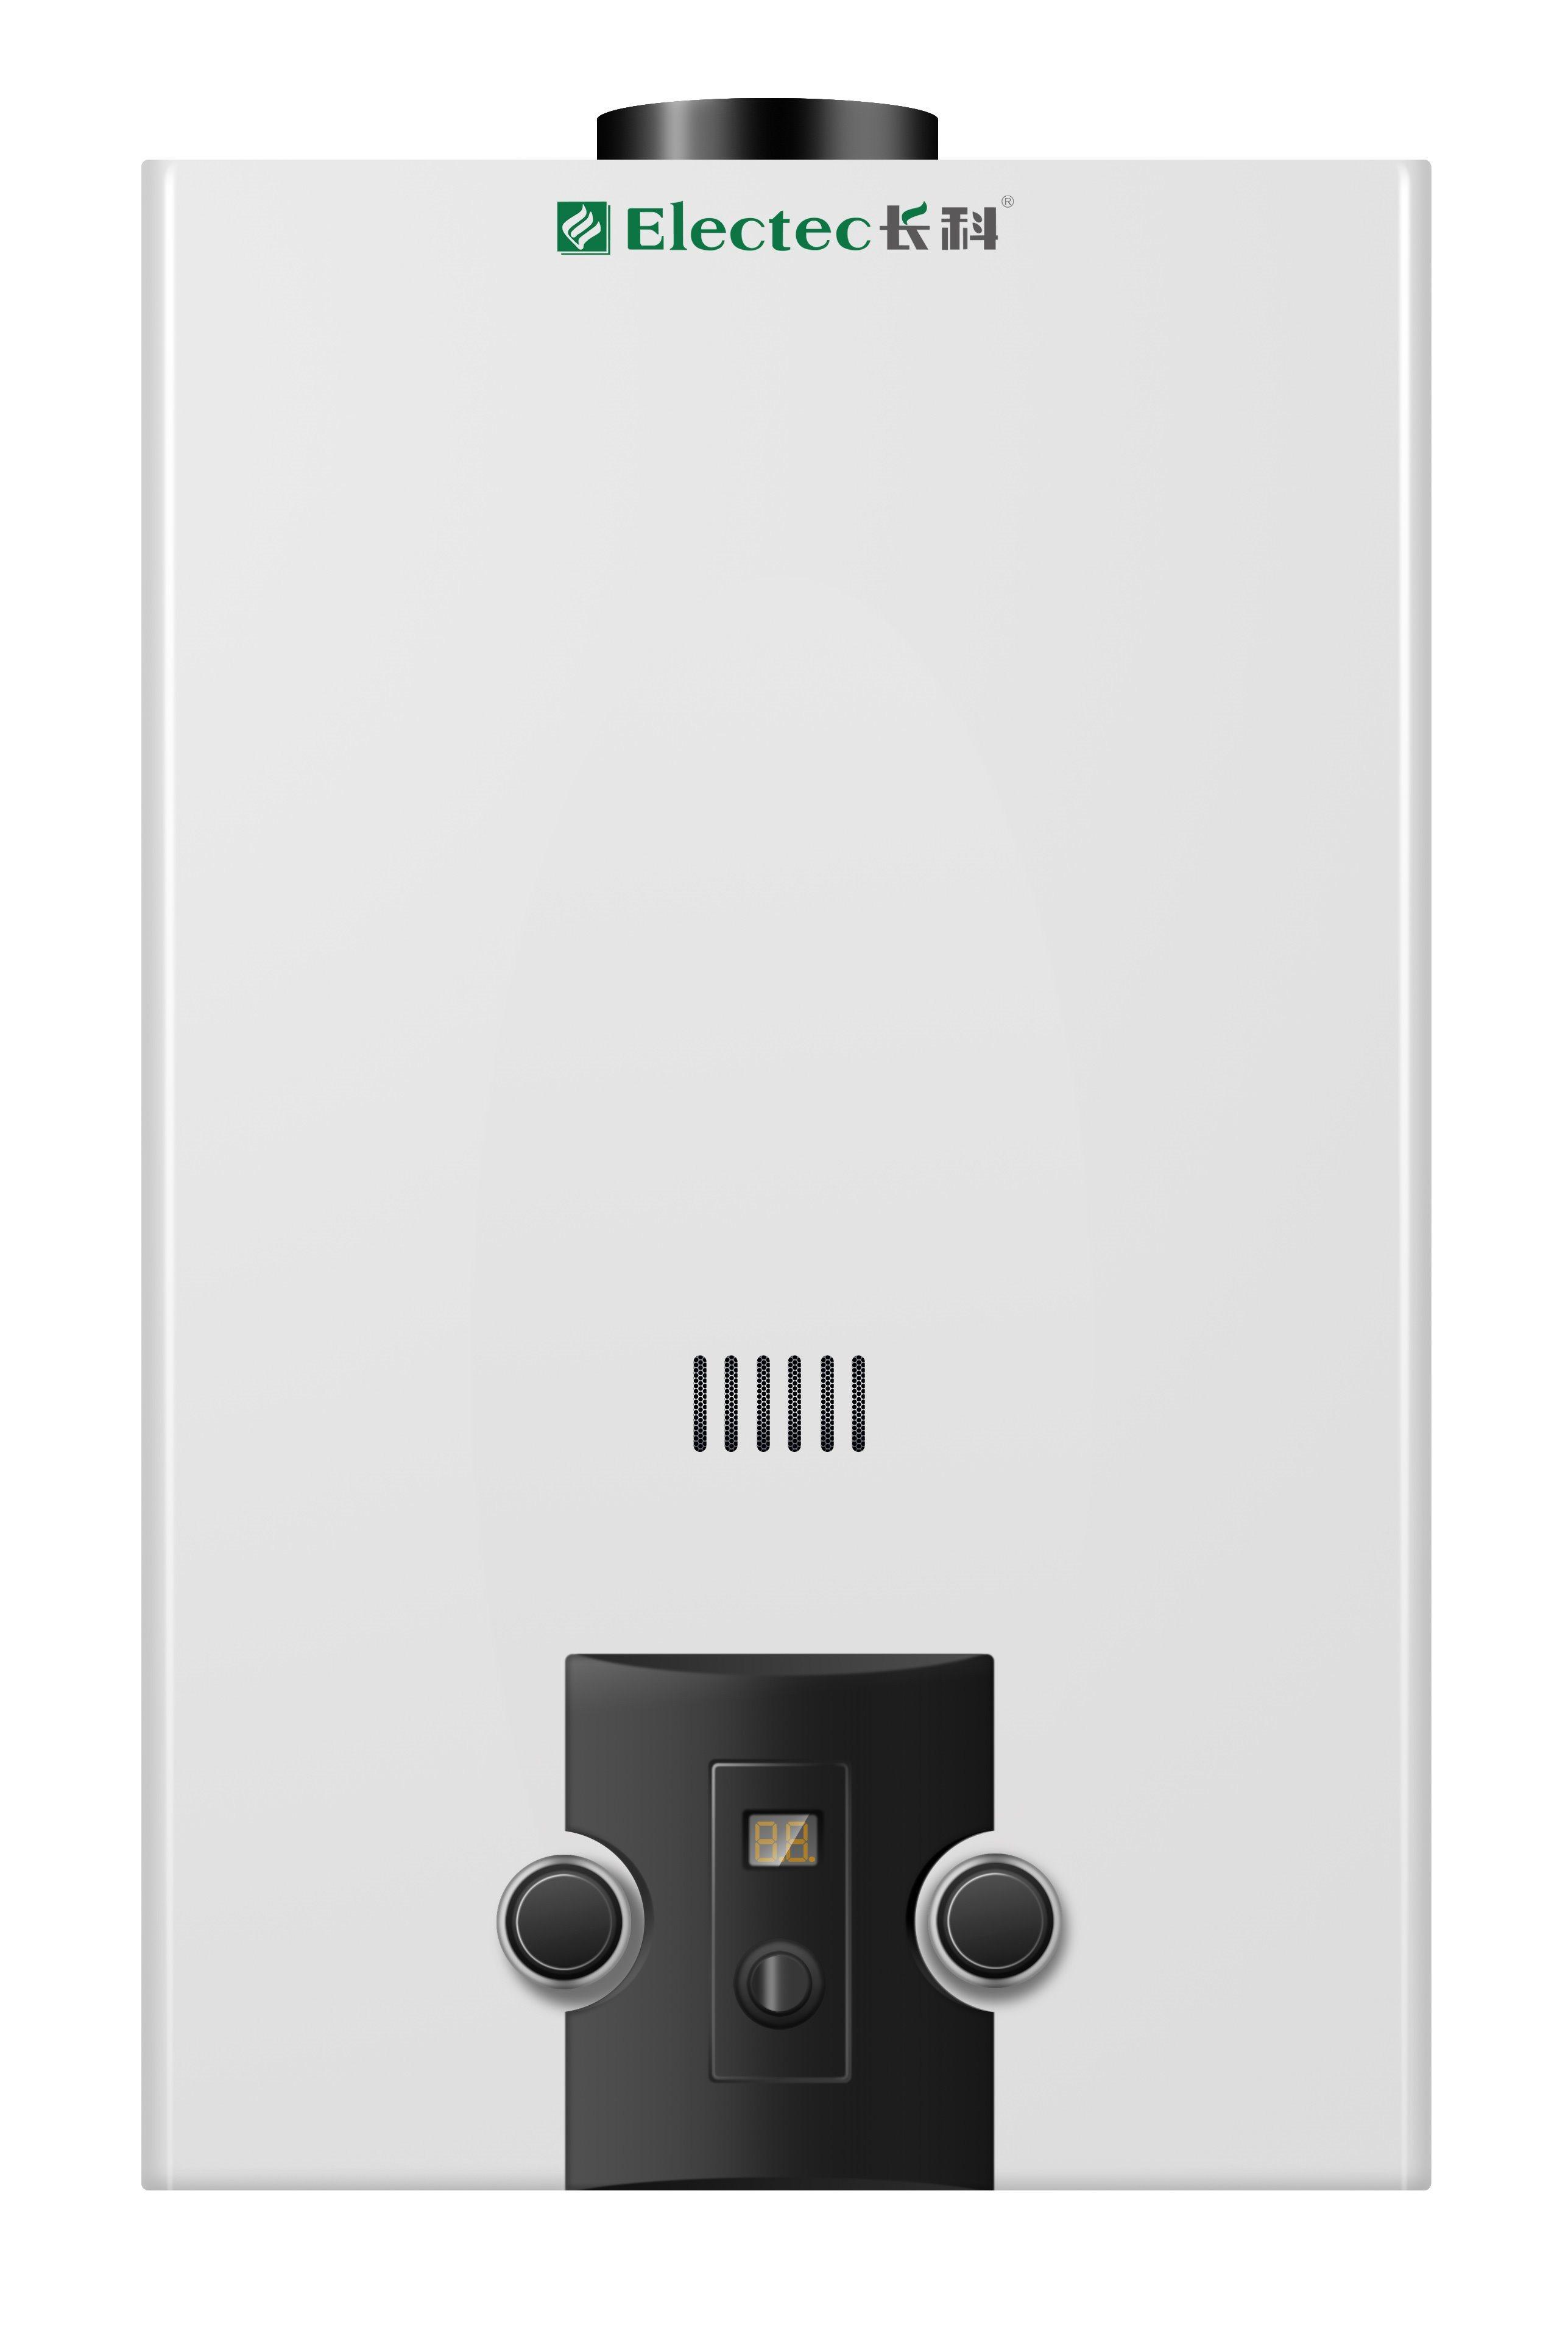 Gas Water Heater New Design (JSD-dB7)